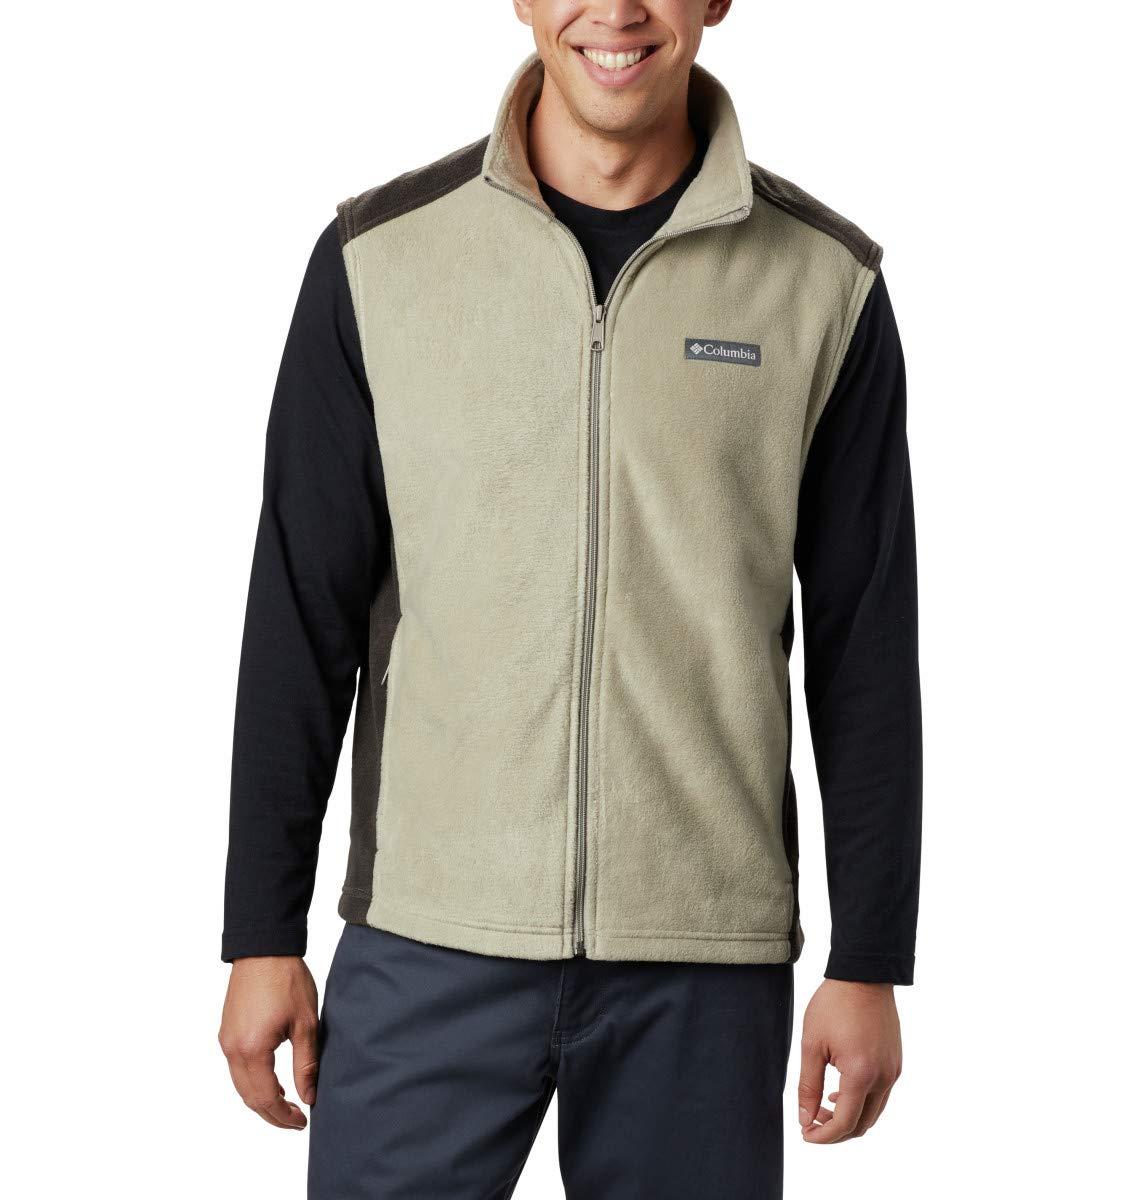 Columbia Men's Steens Mountain Full Zip Soft Fleece Vest, Tusk, Buffalo, 3X by Columbia